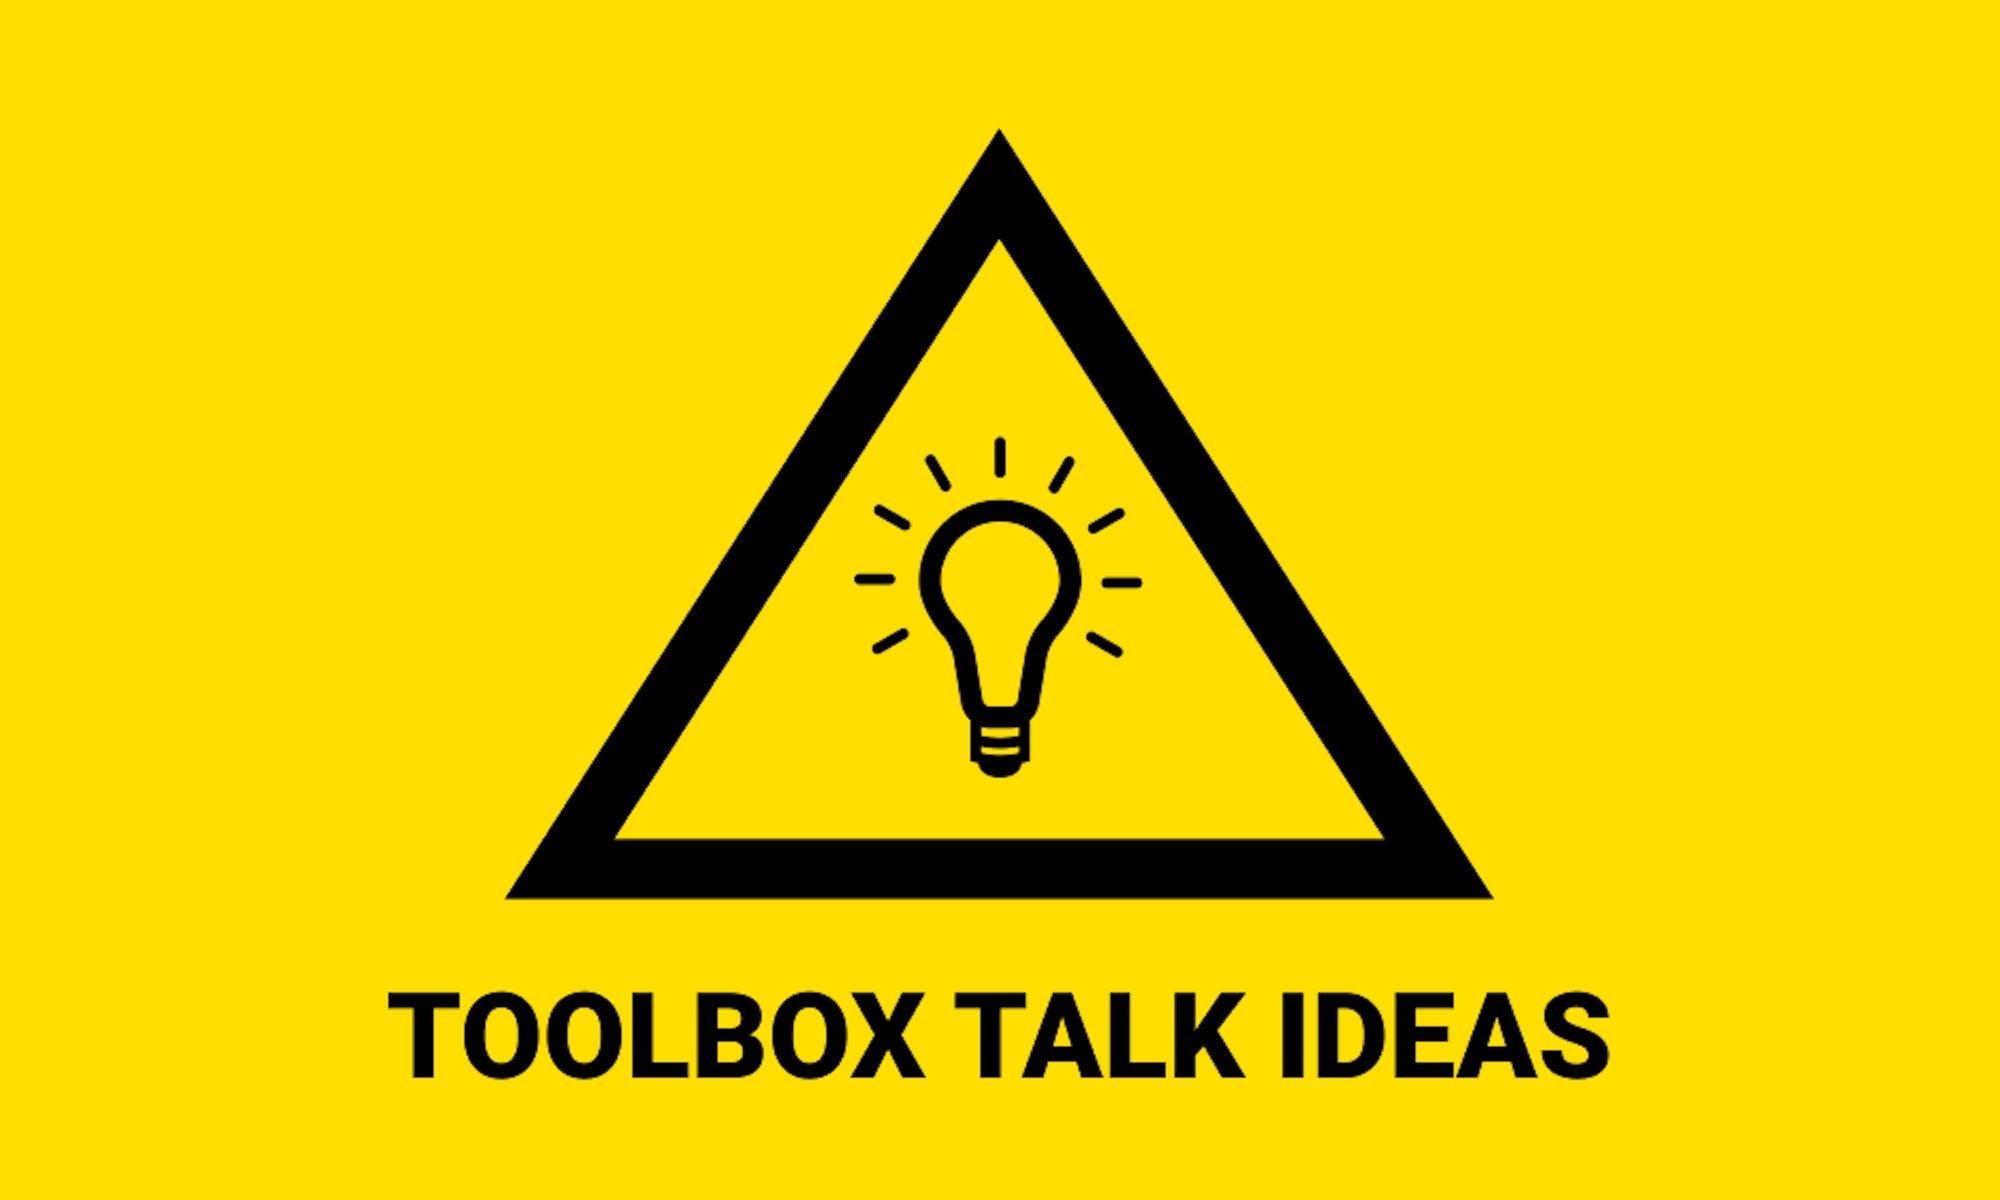 Toolbox talk ideas